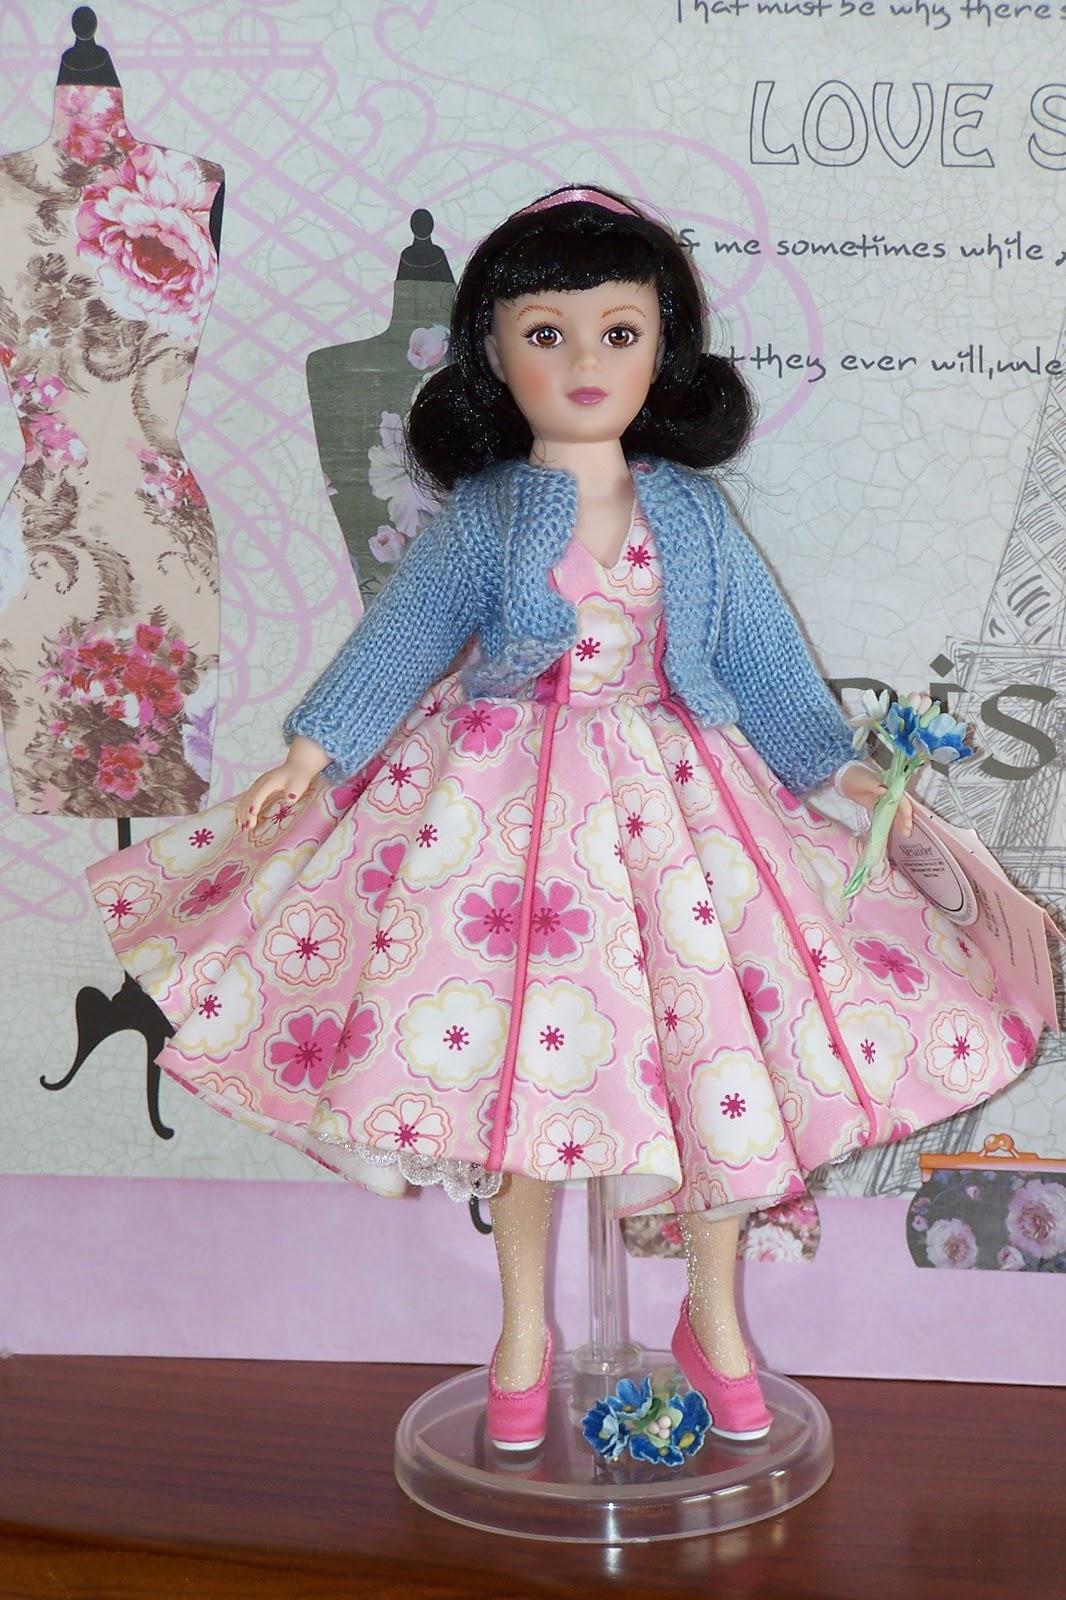 Lizzie 39 s arty crafty 39 n dolls dolls madame alexander coquette jacqui - Madame coquette ...